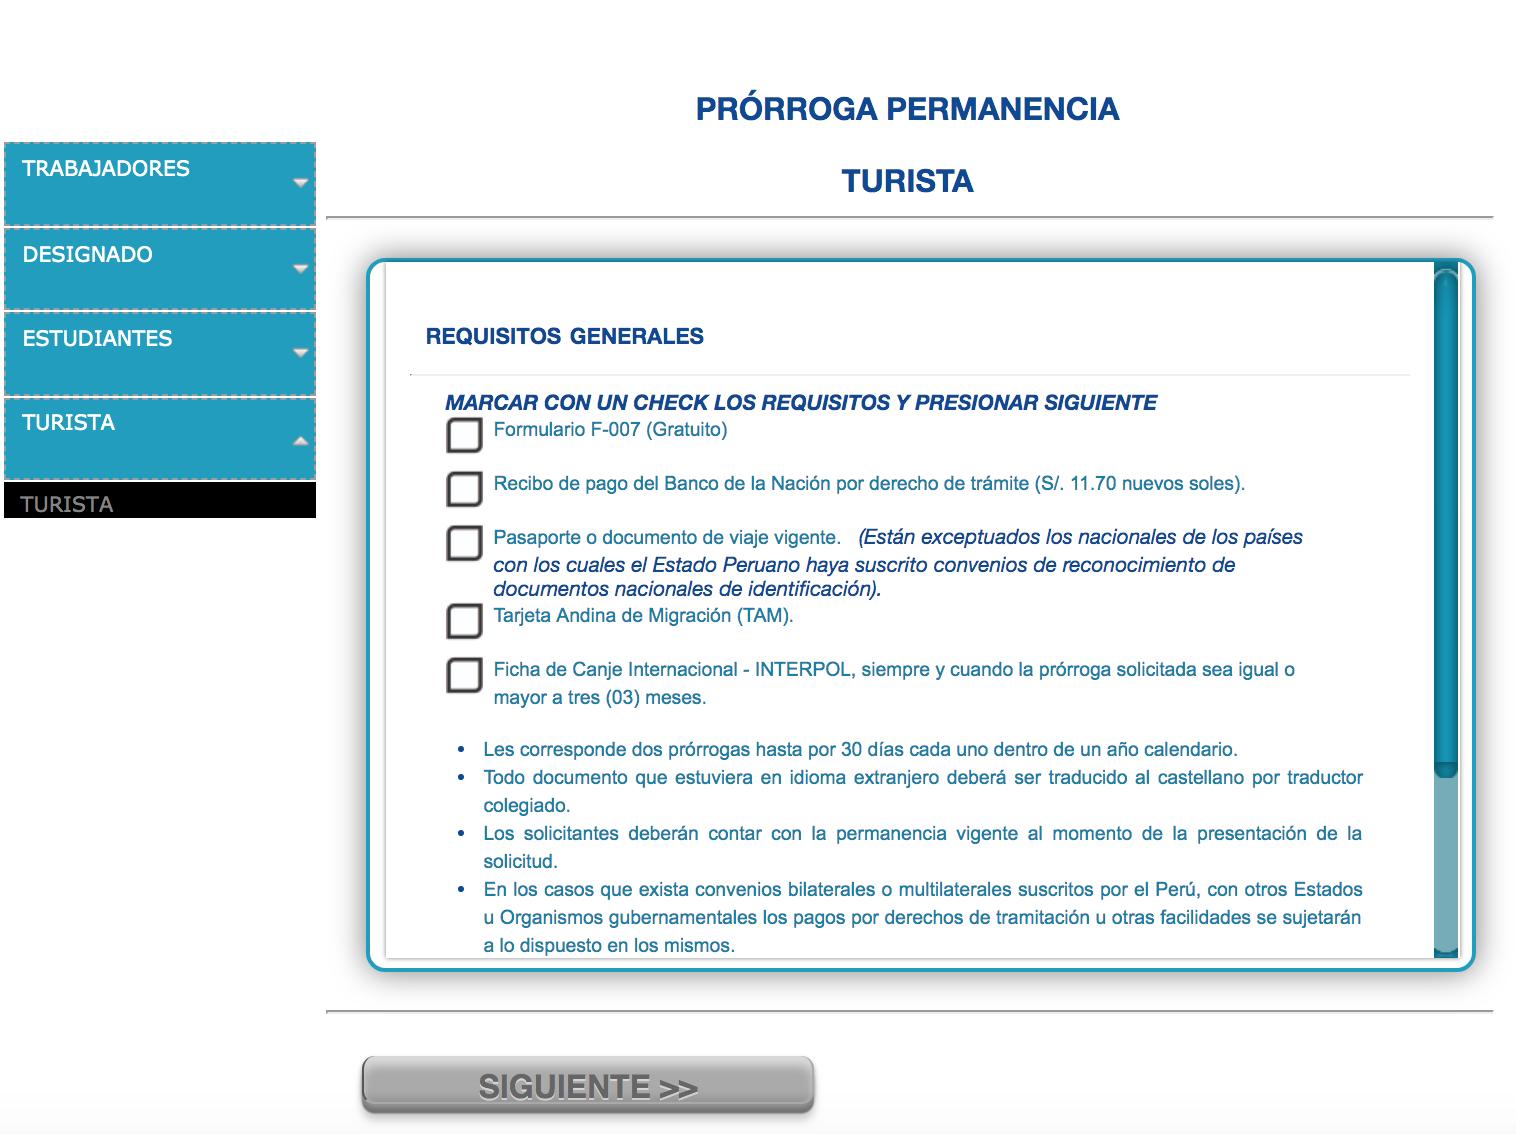 Peru visa extension PRORROGA PERMANENCIA